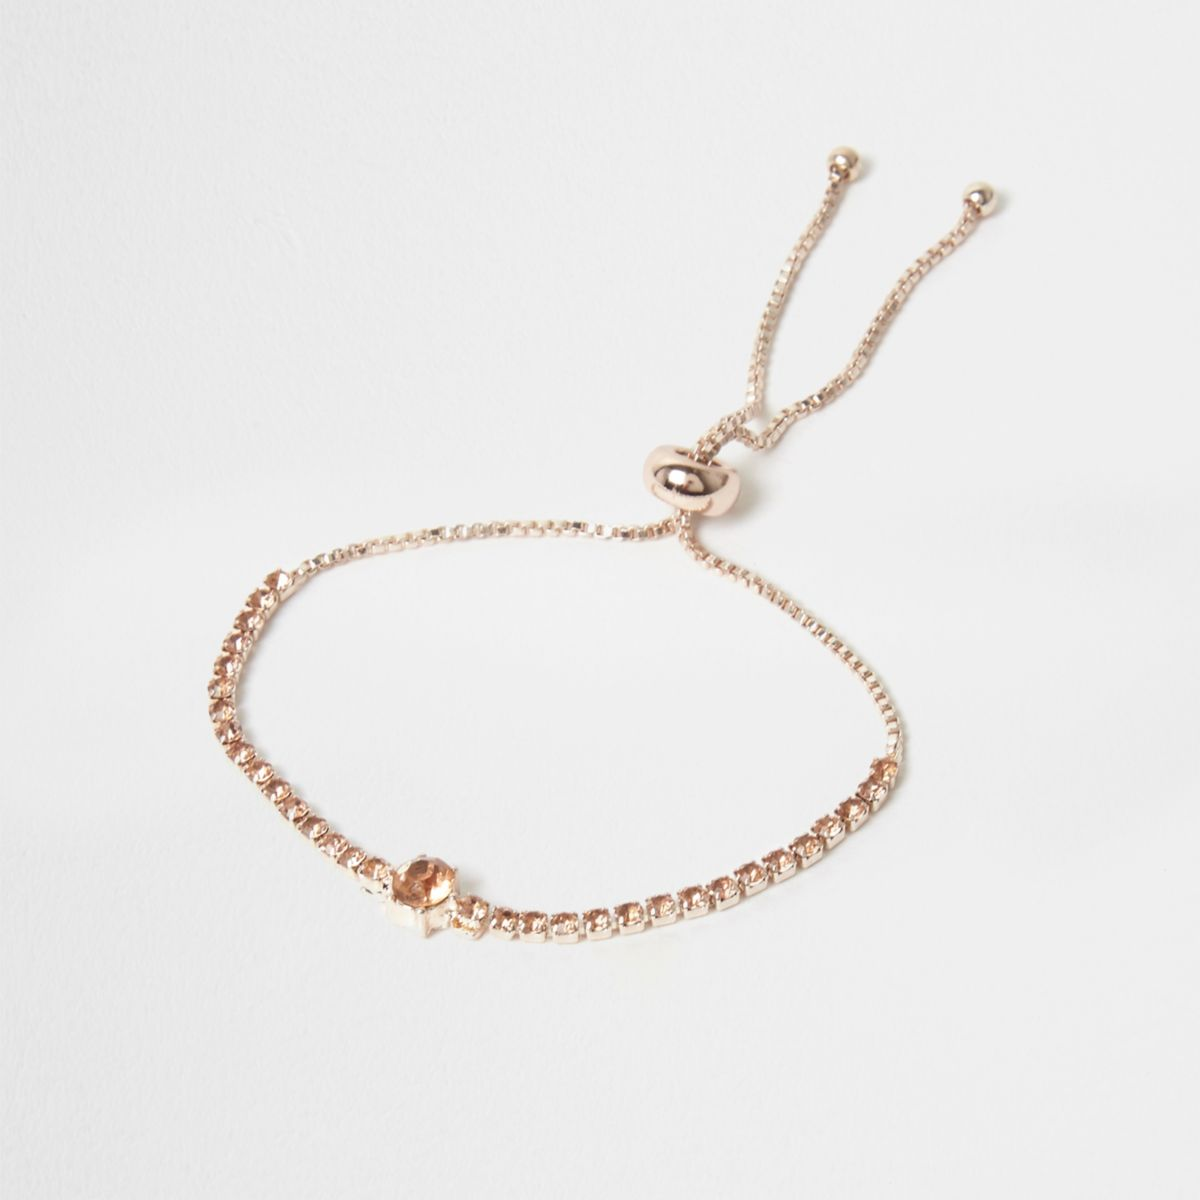 Rose gold tone cup chain lariat bracelet